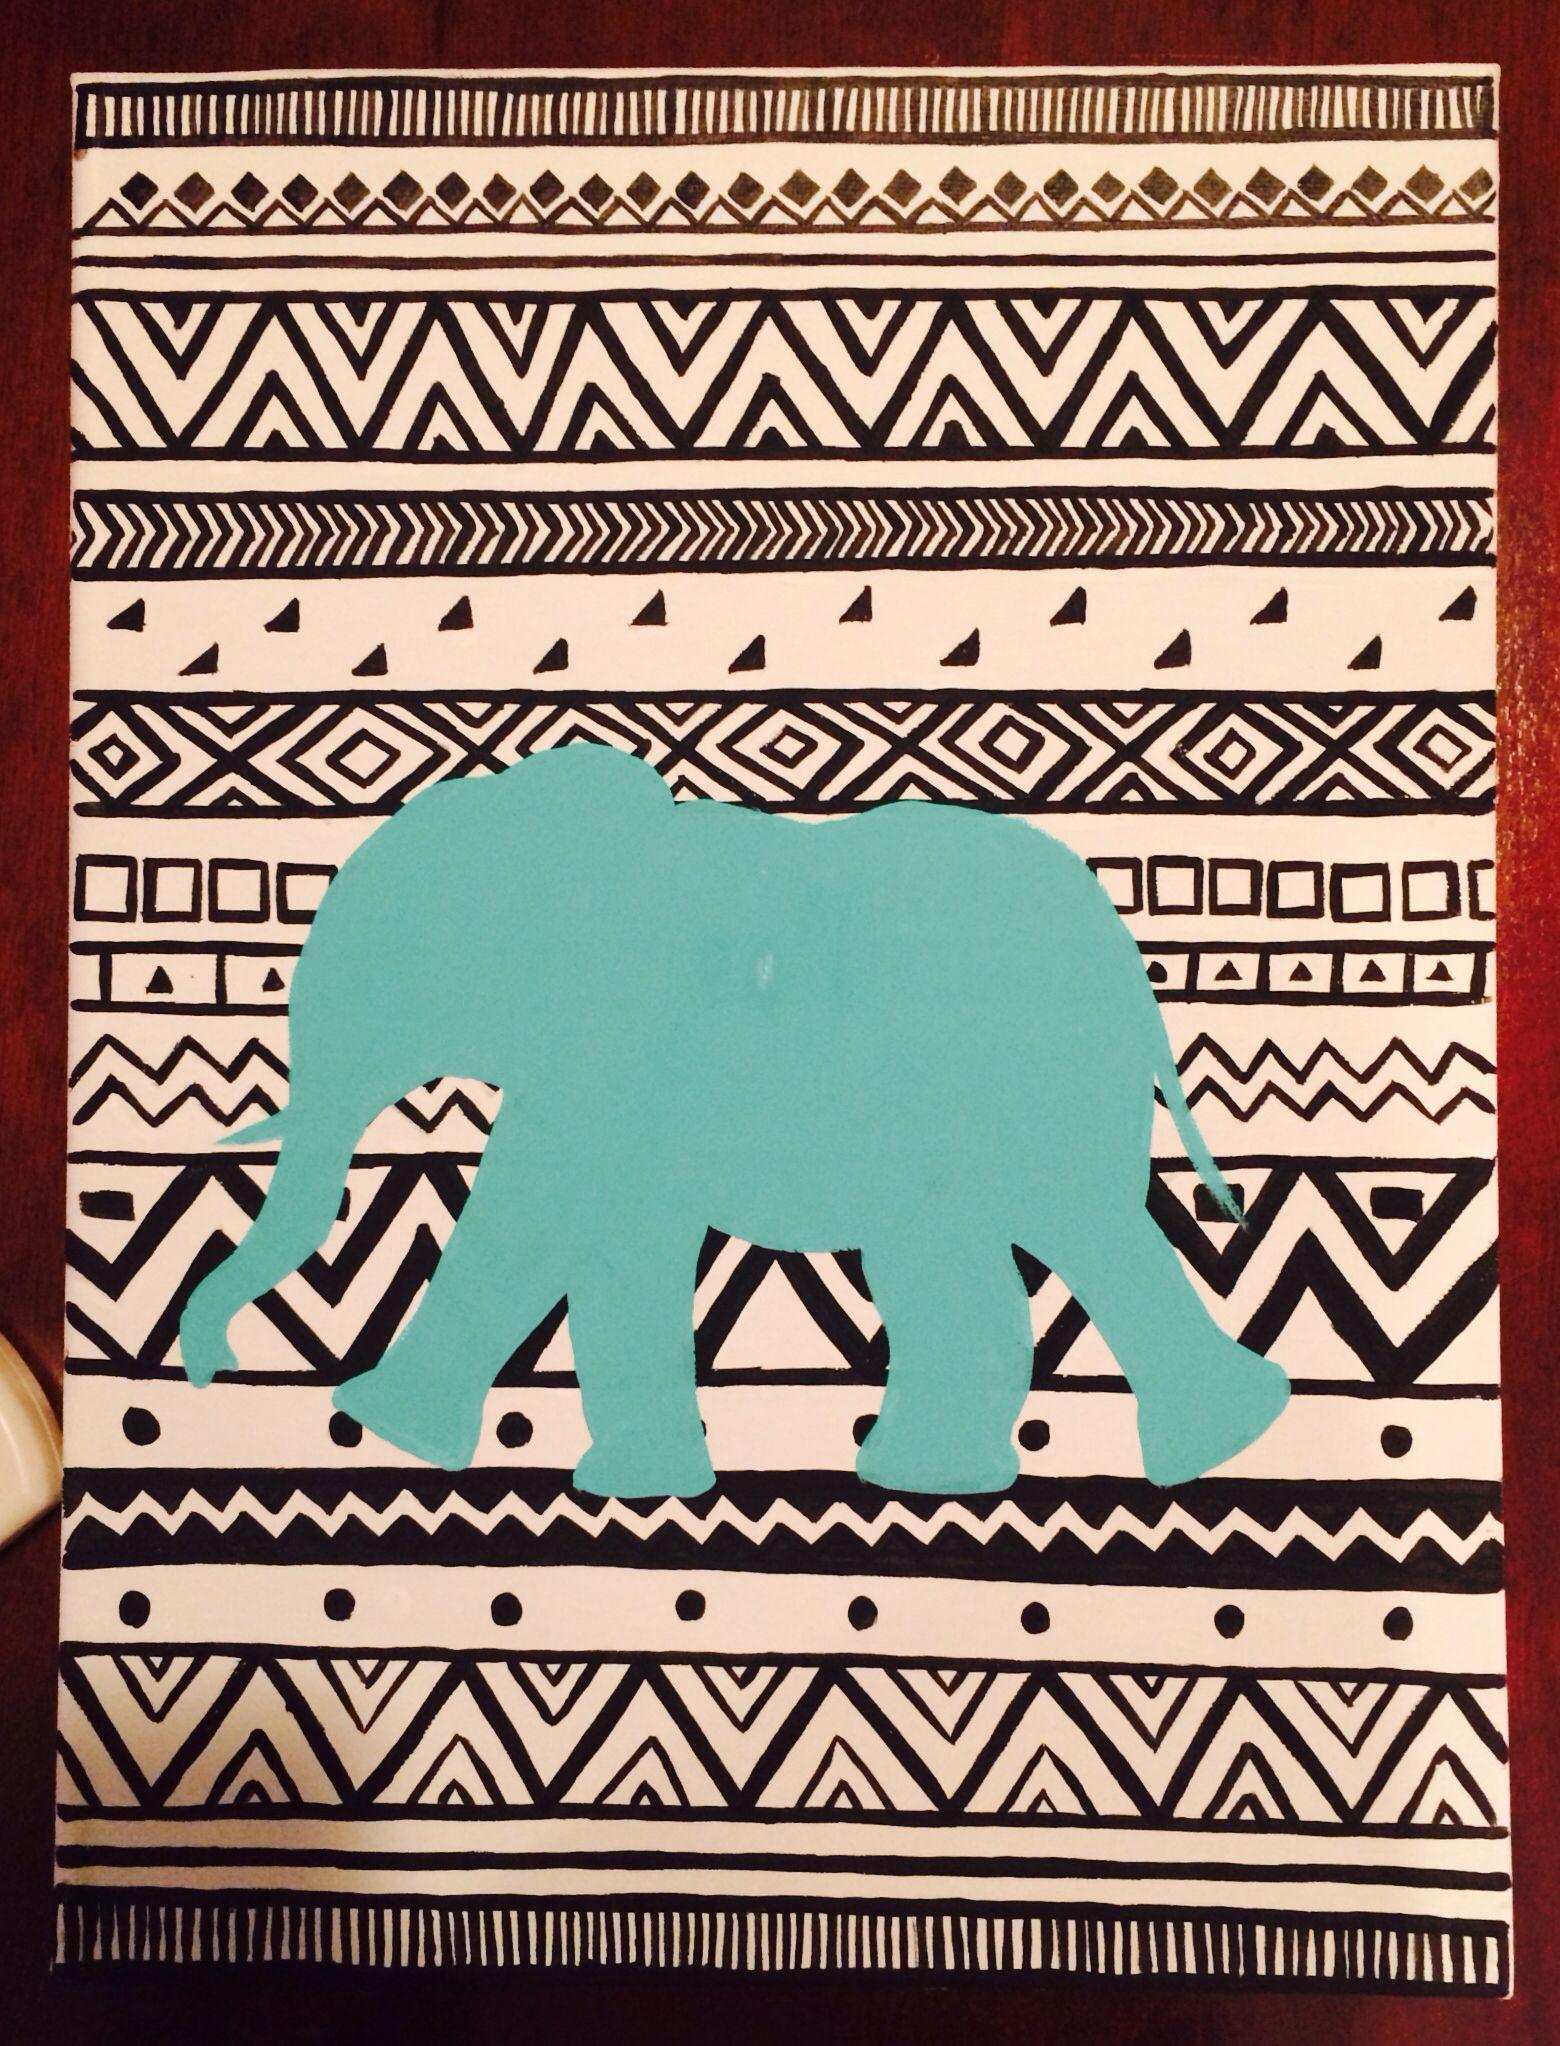 DIY College Dorm Decor, Tribal Elephant Canvas Art | Room ...